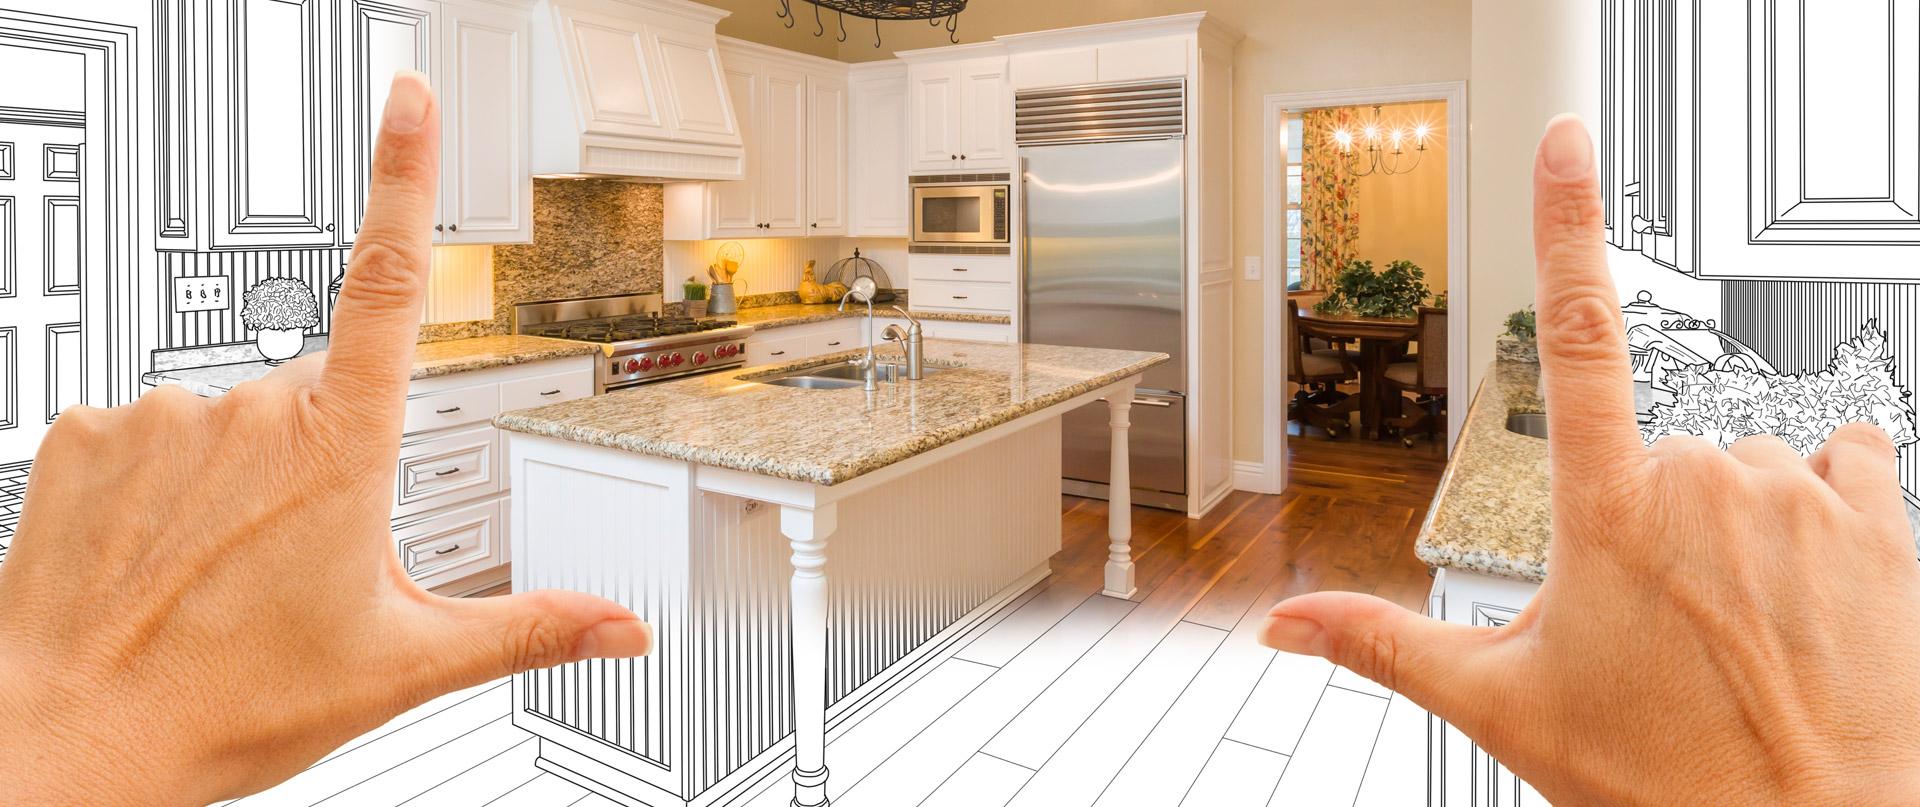 Bathroom Furniture Kitchen Design Milton Keynes kitchens bathrooms bedrooms studies kbs interiors northampton traditional and modern kitchen designs